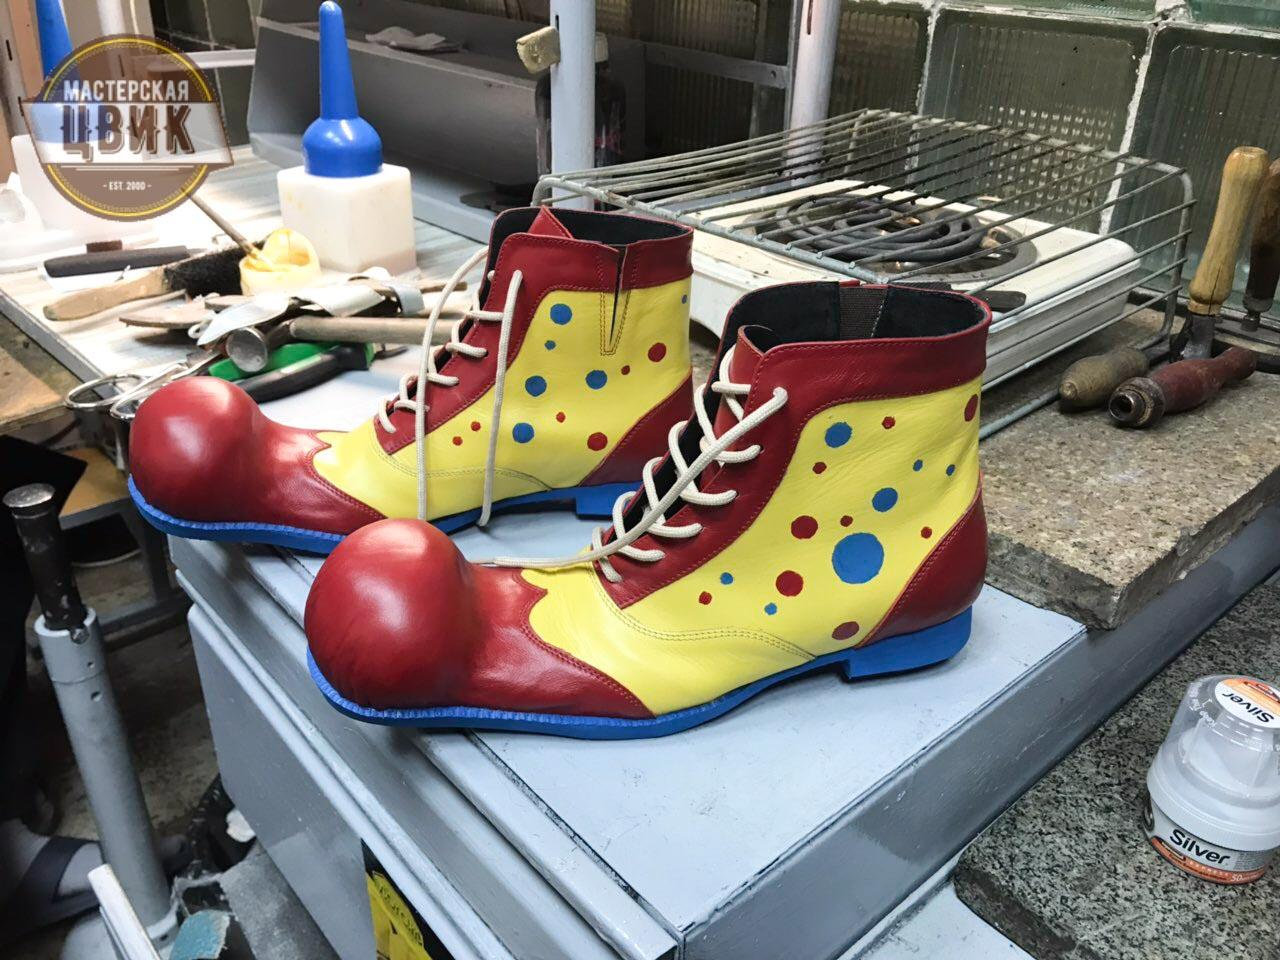 individualnyj-poshiv-obuvi-minsk-71 Индивидуальный пошив обуви